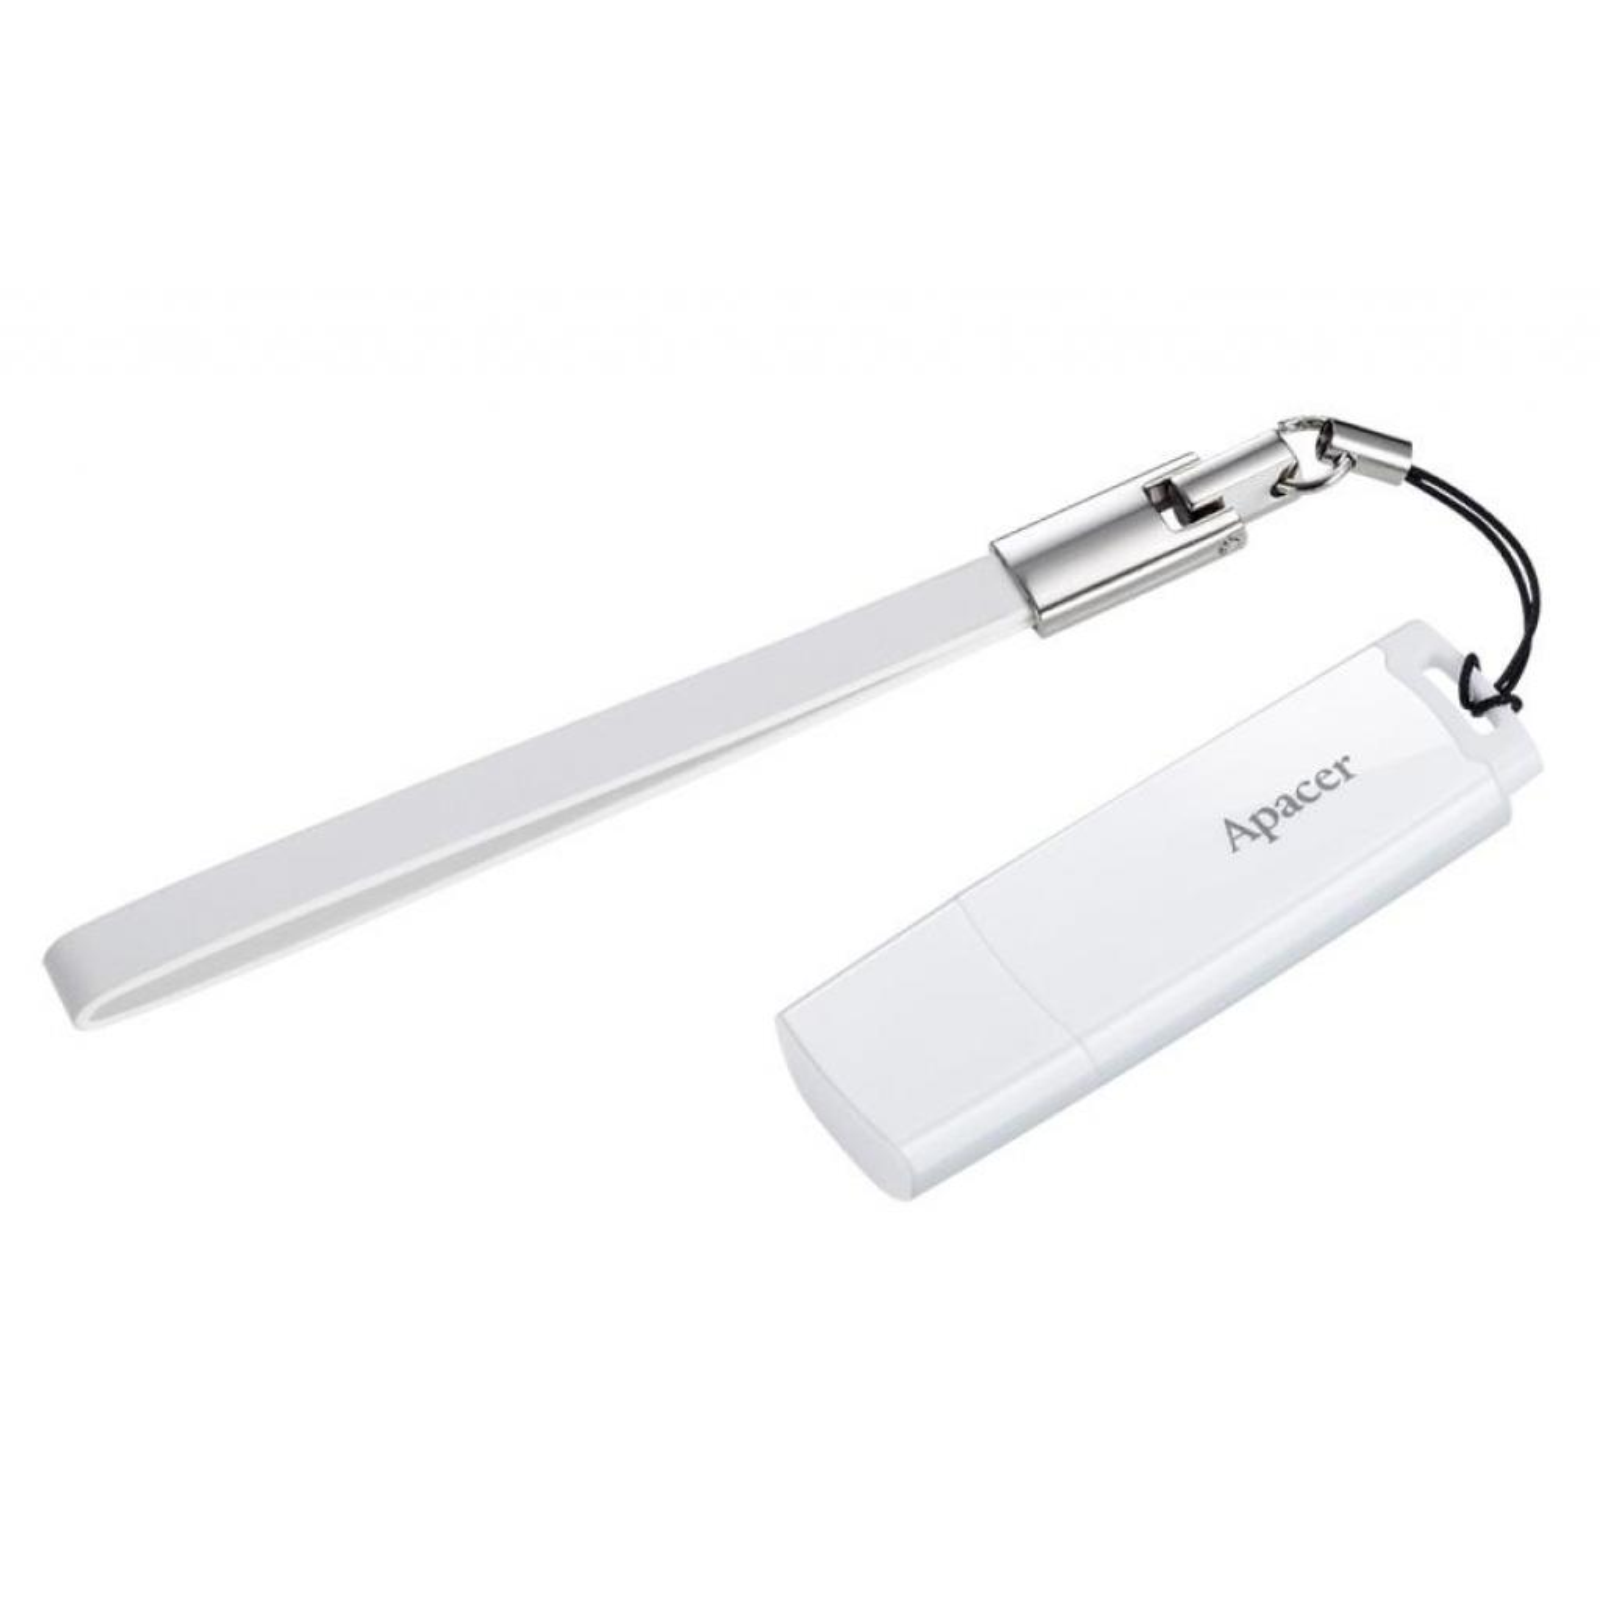 USB флеш накопитель Apacer 16GB AH336 White USB 2.0 (AP16GAH336W-1) изображение 3